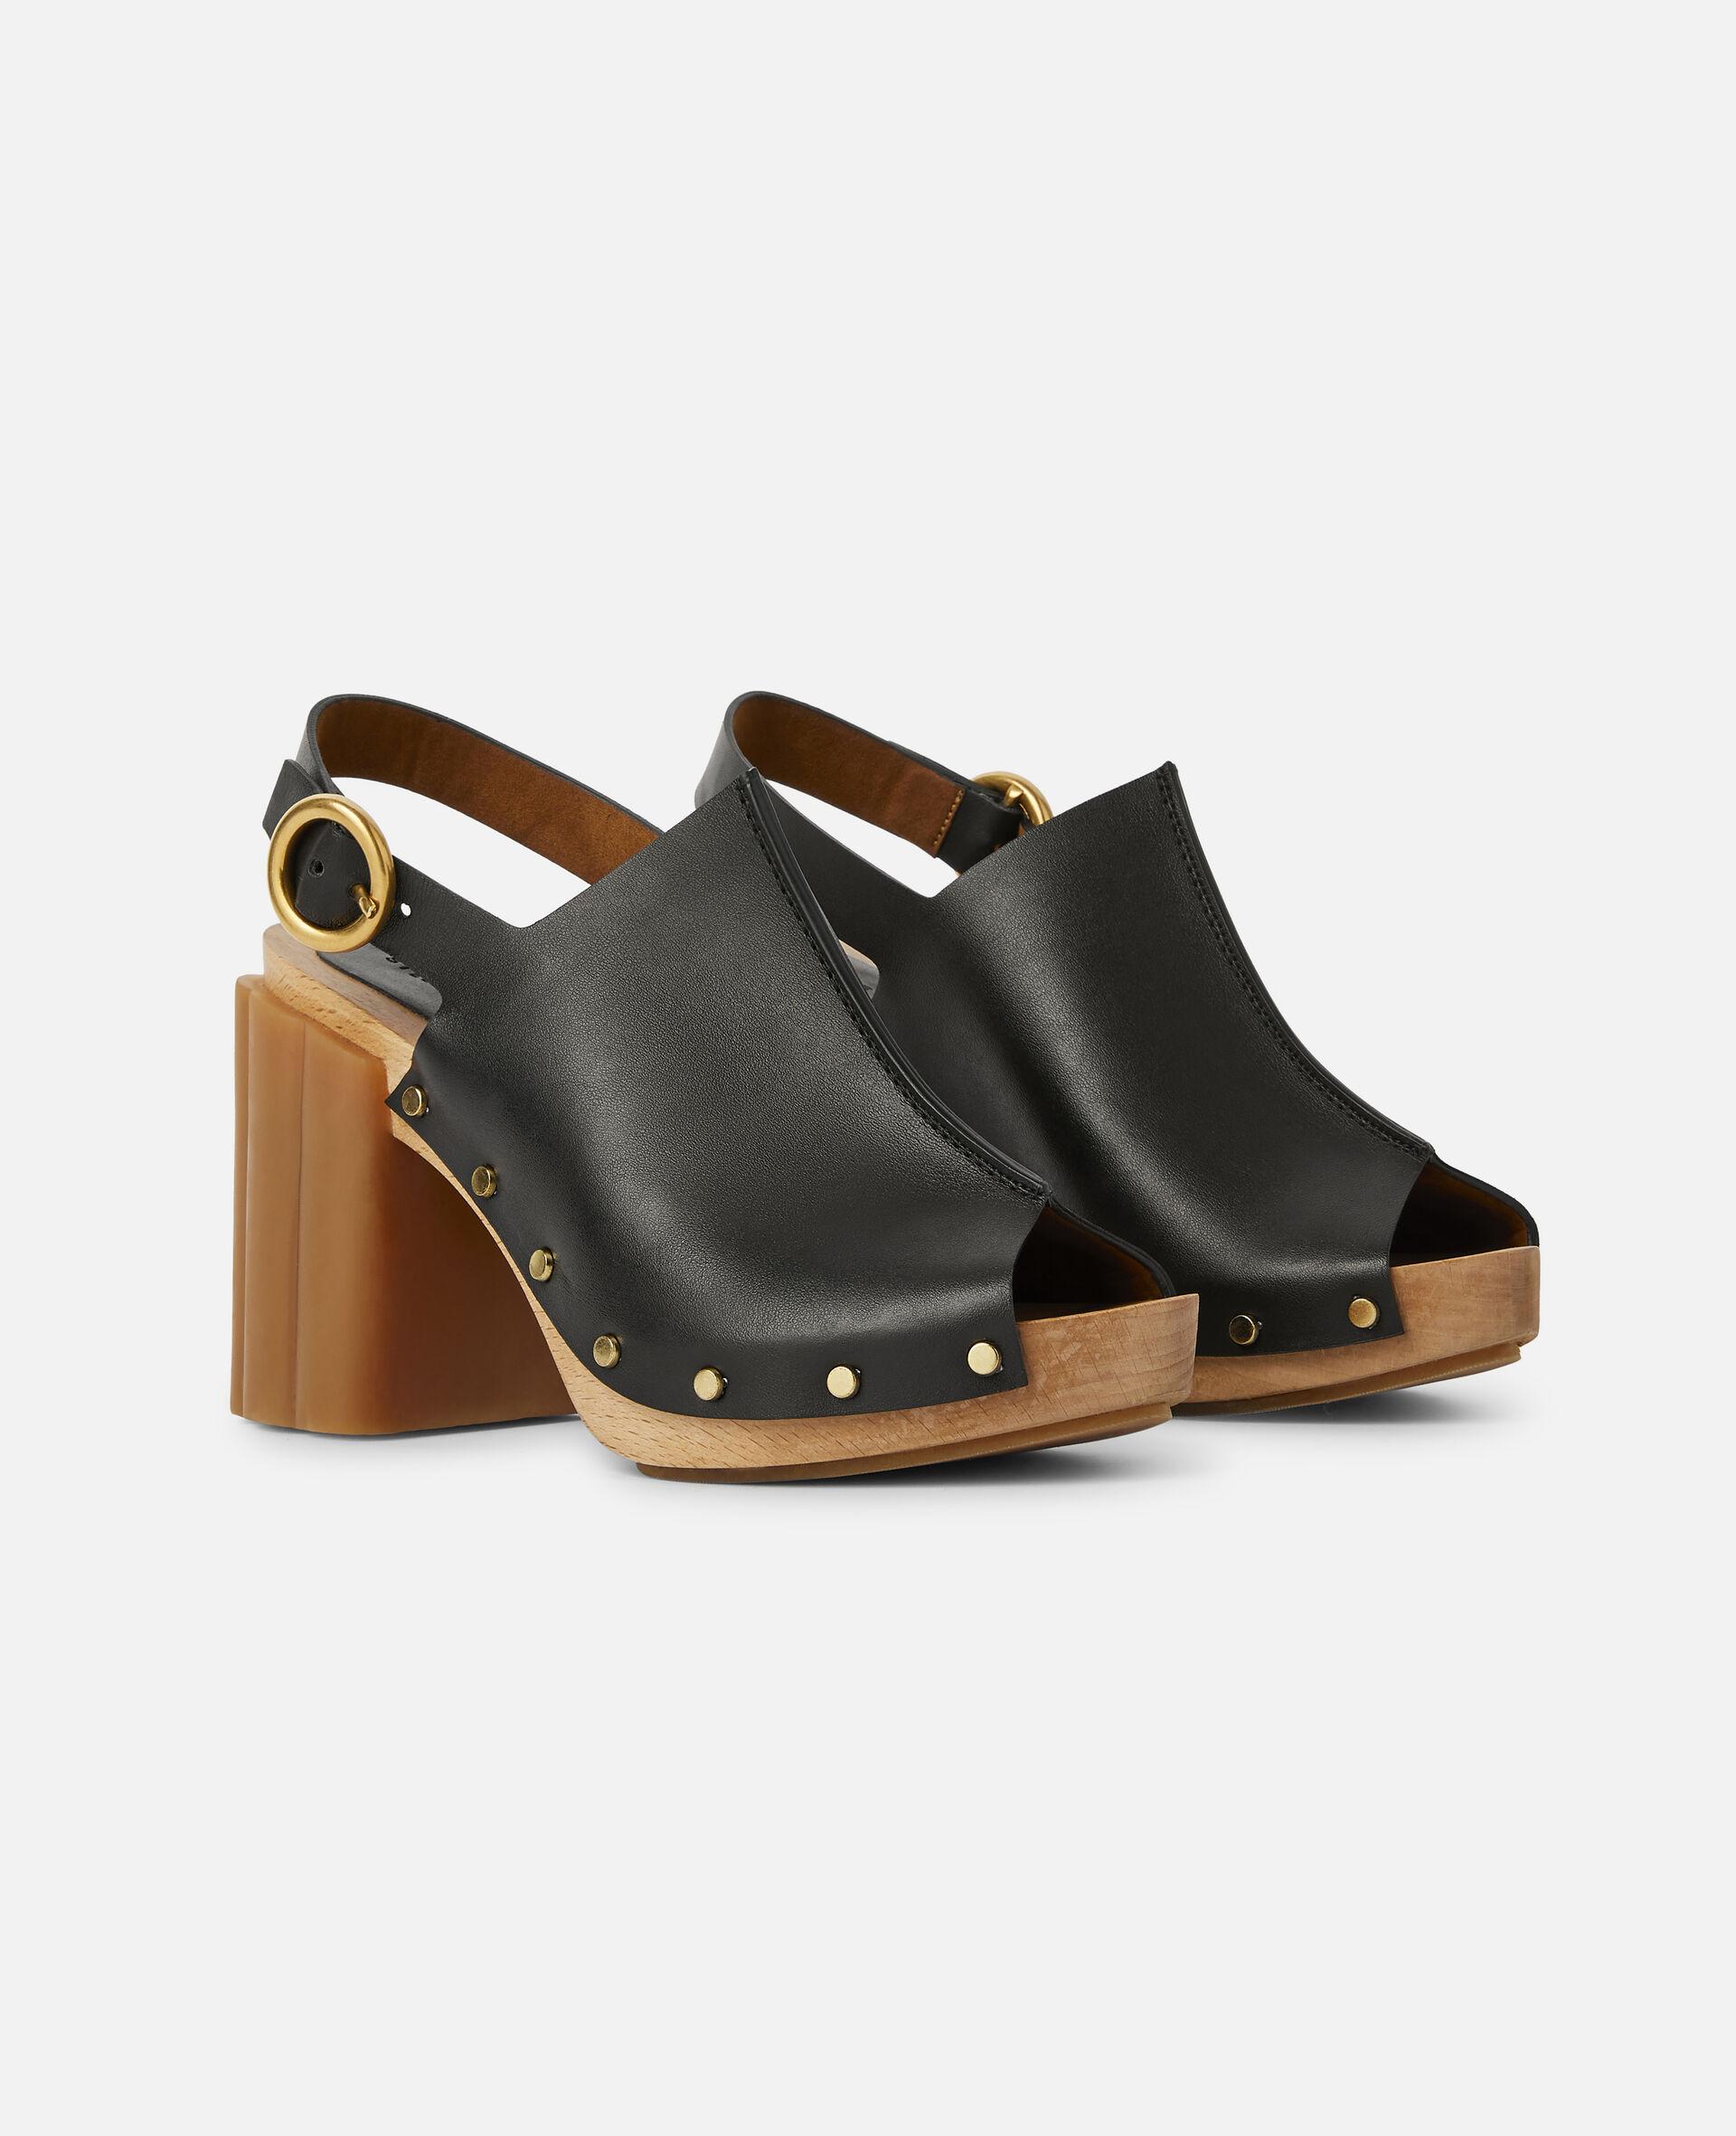 Daisy Stud Hardware Sandals-Black-large image number 1